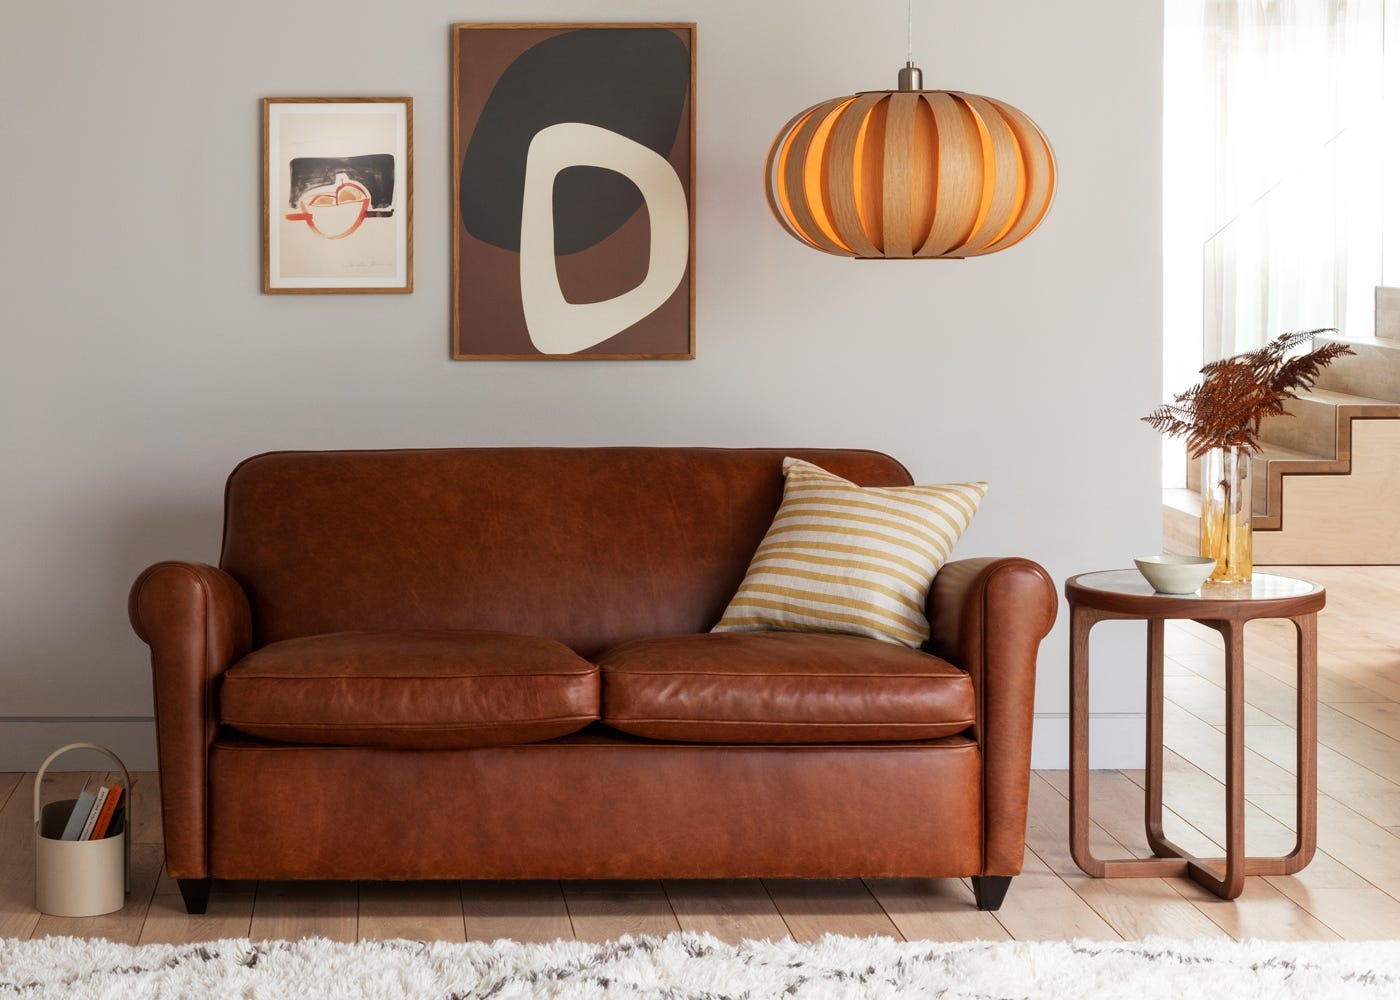 Barrington II 2-Seater Sofa - Interior